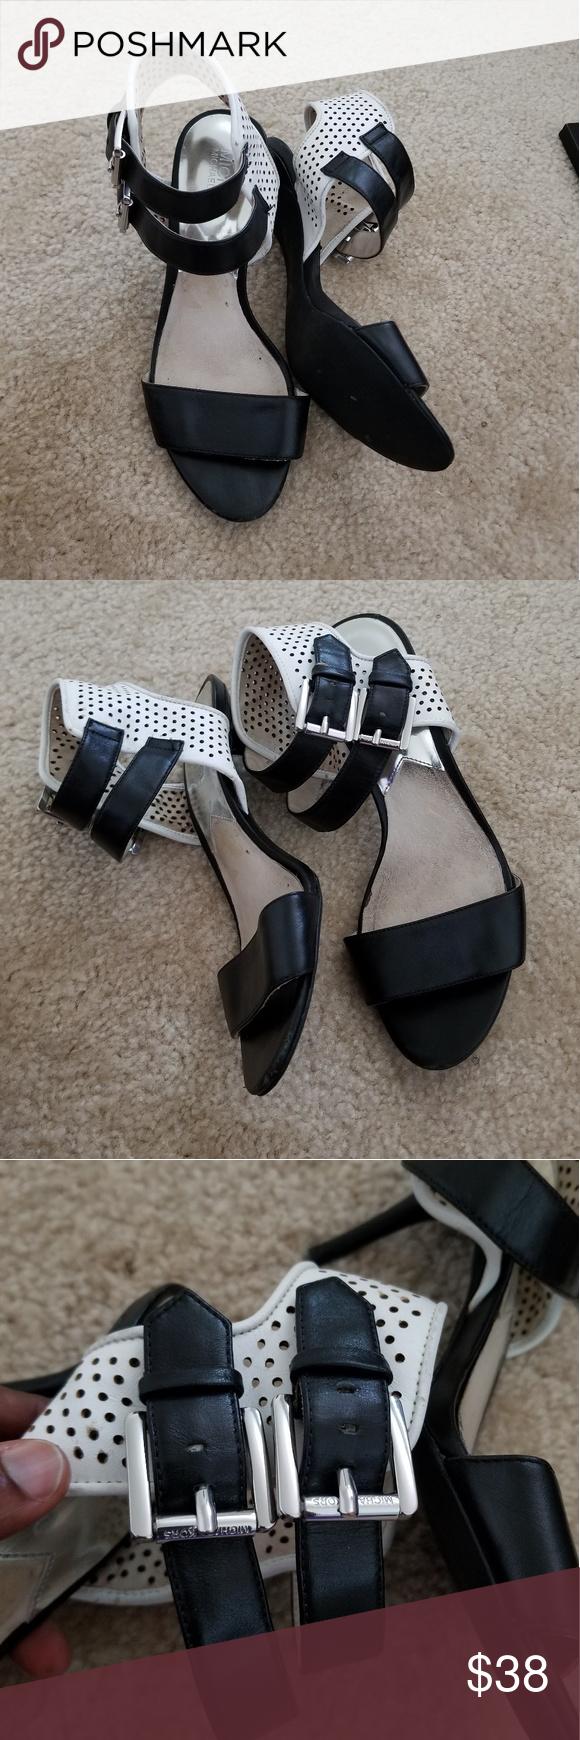 Cute MK shoes Cute MK shoes. Worn a few times and show